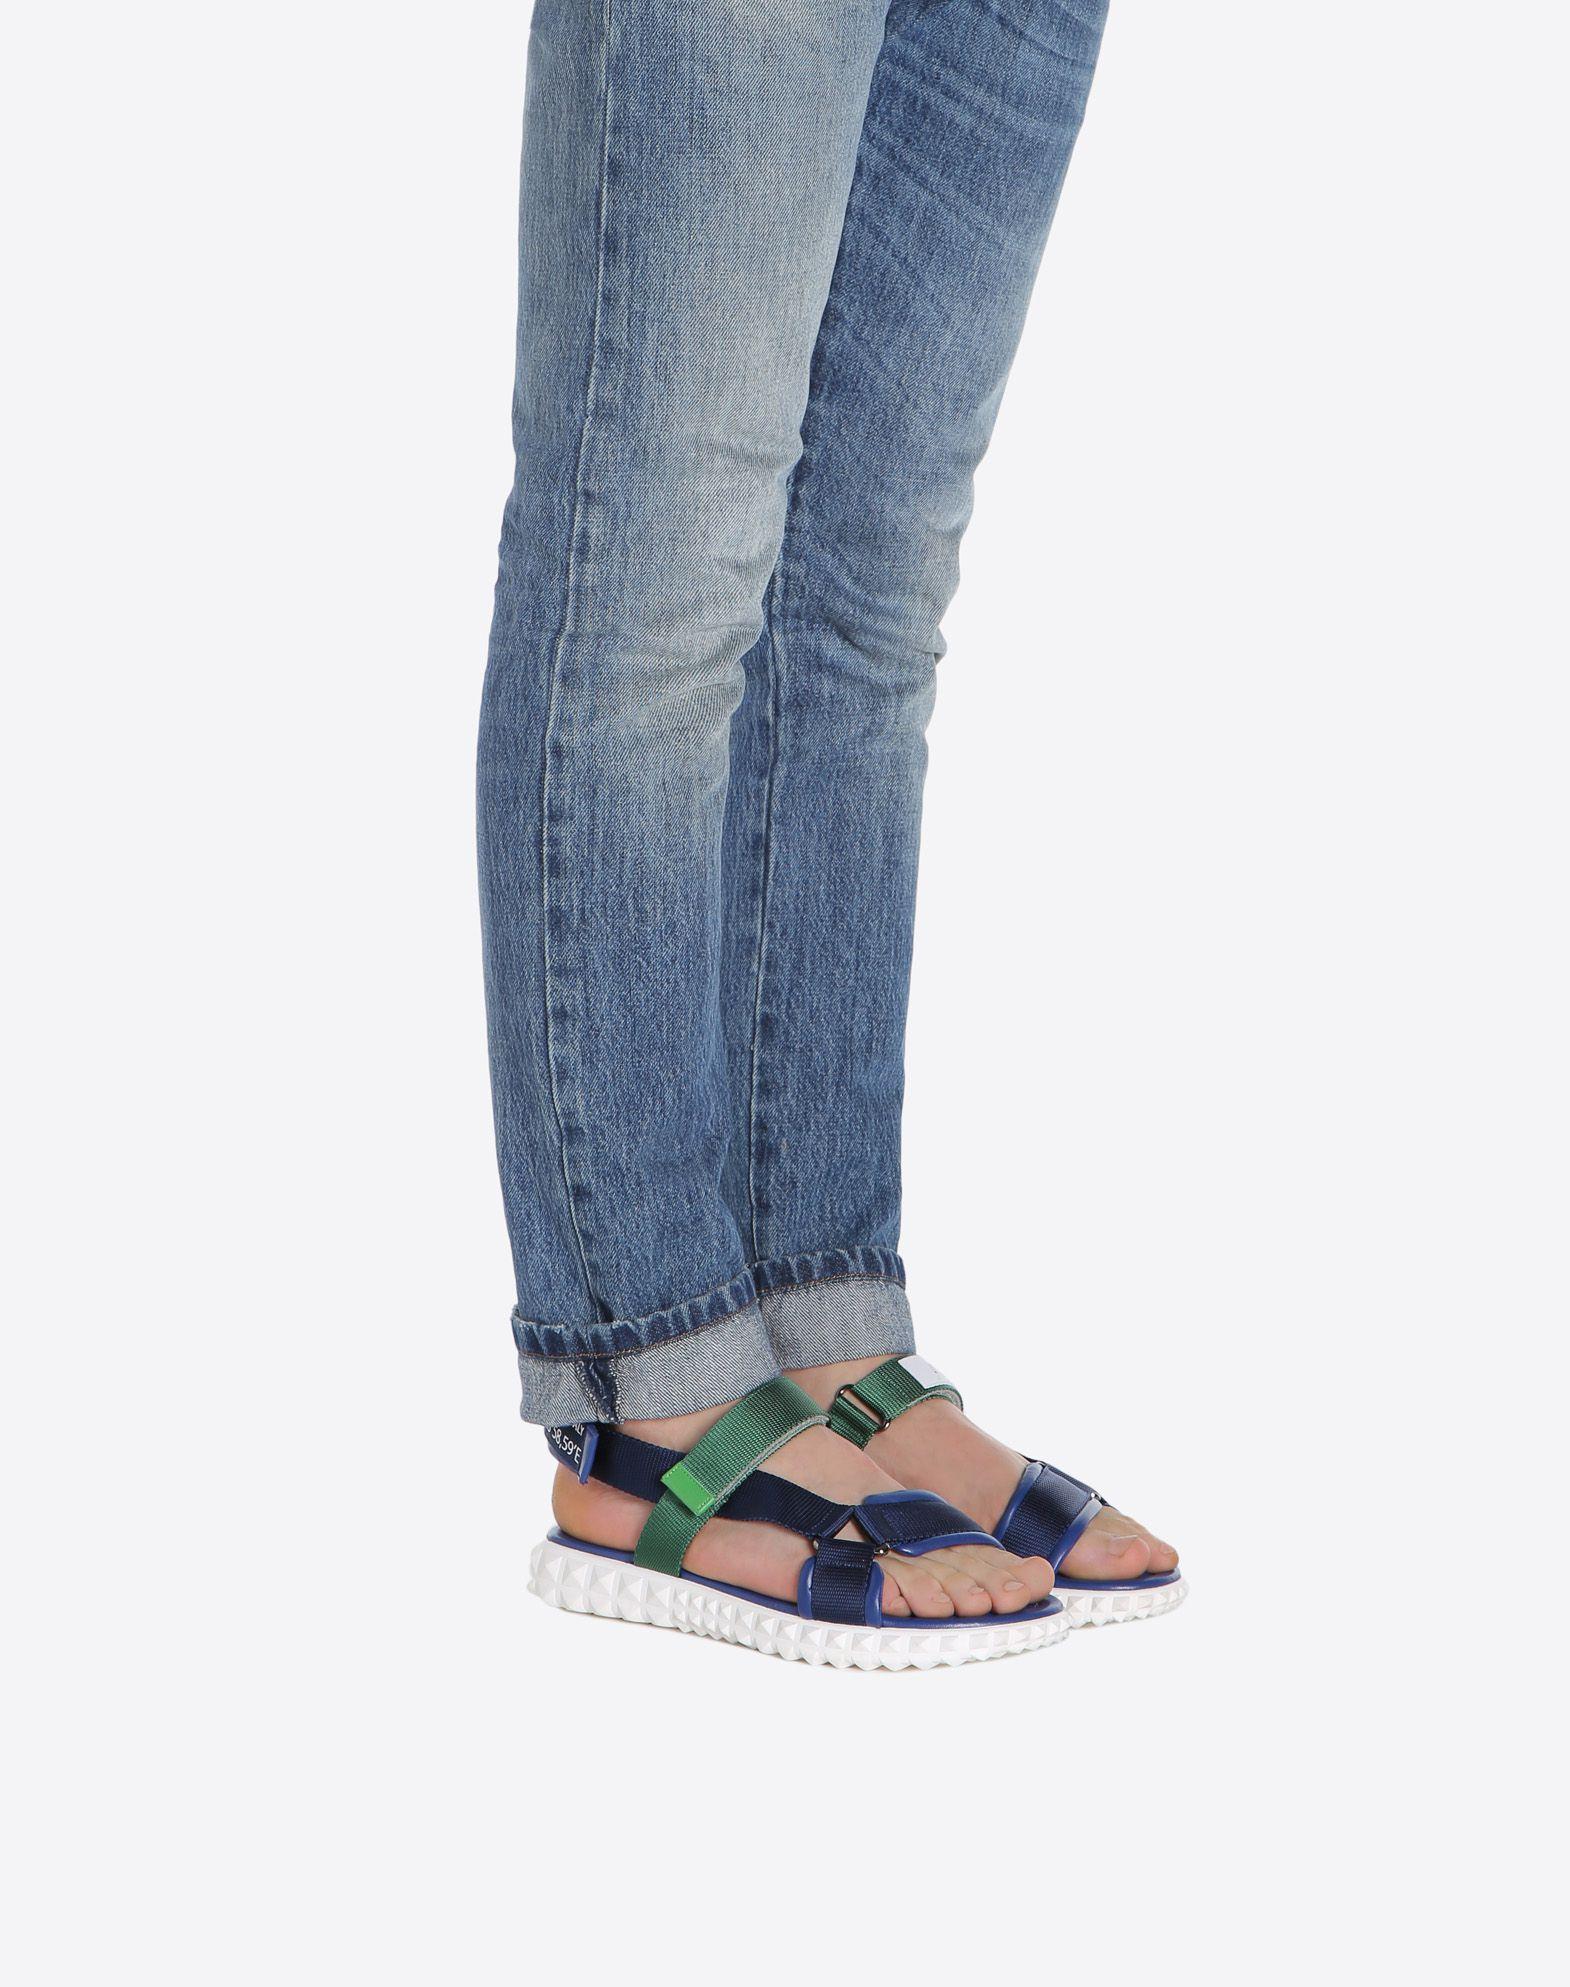 VALENTINO GARAVANI UOMO Coordinates 凉鞋 FLAT SANDALS U a